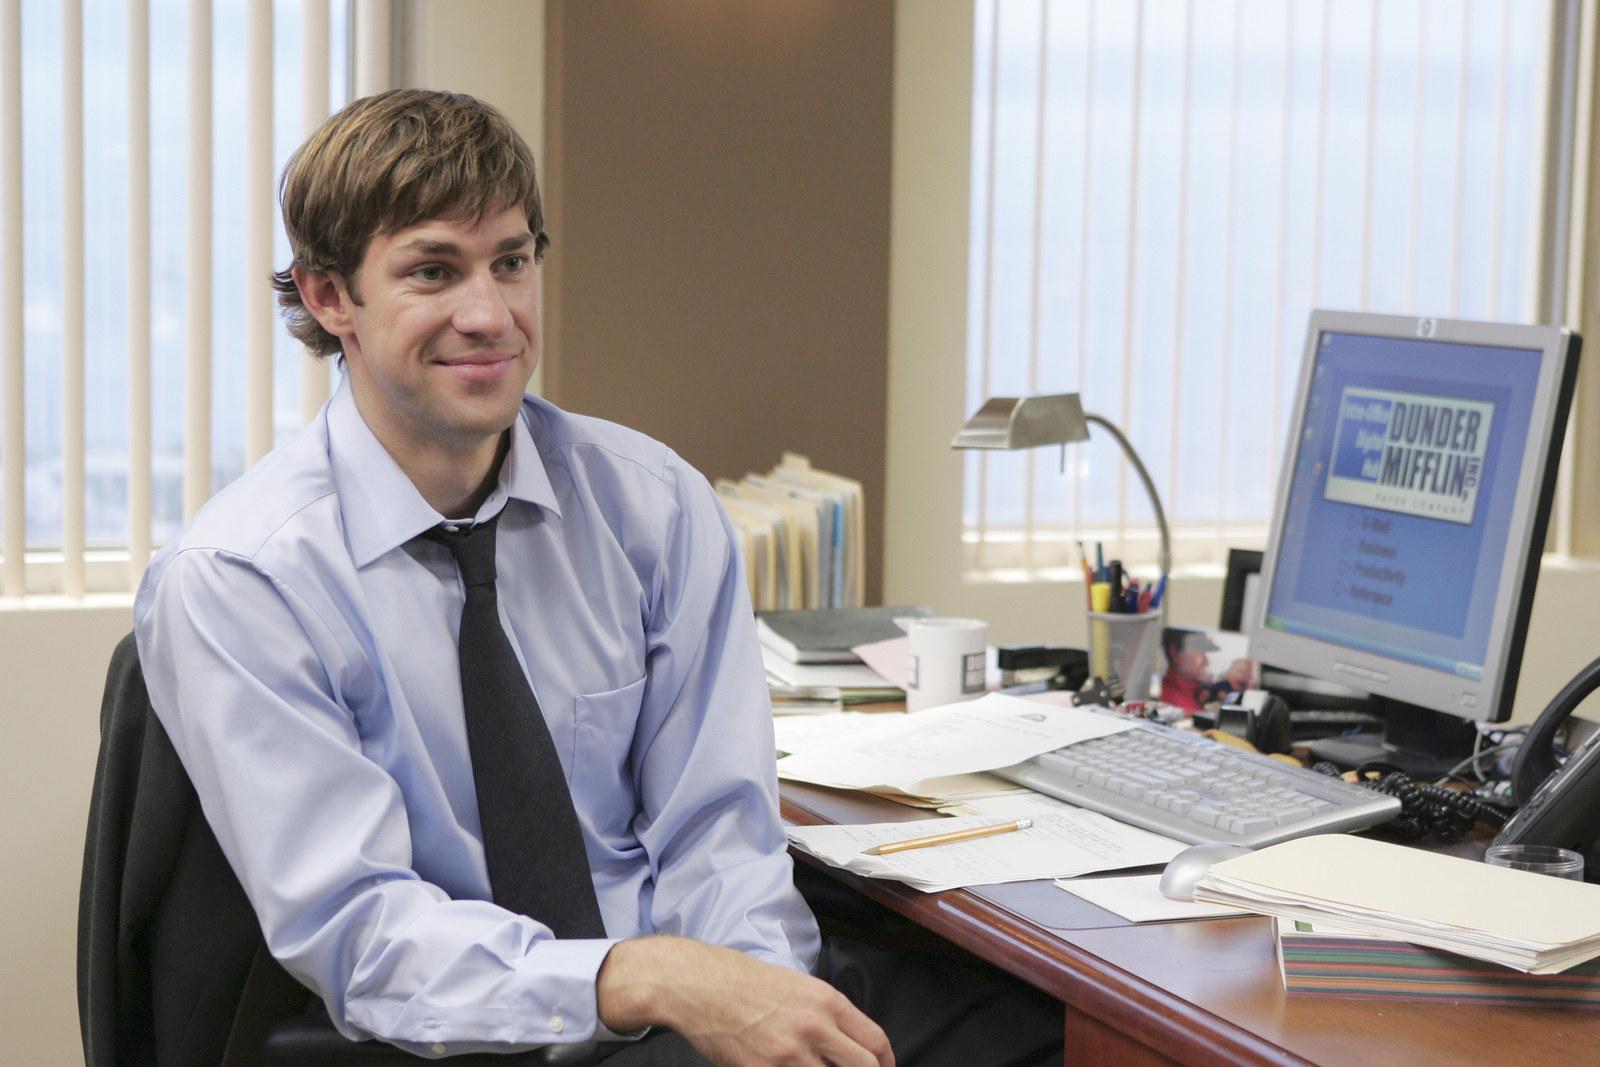 Krasinski as Jim Halpert in The Office.